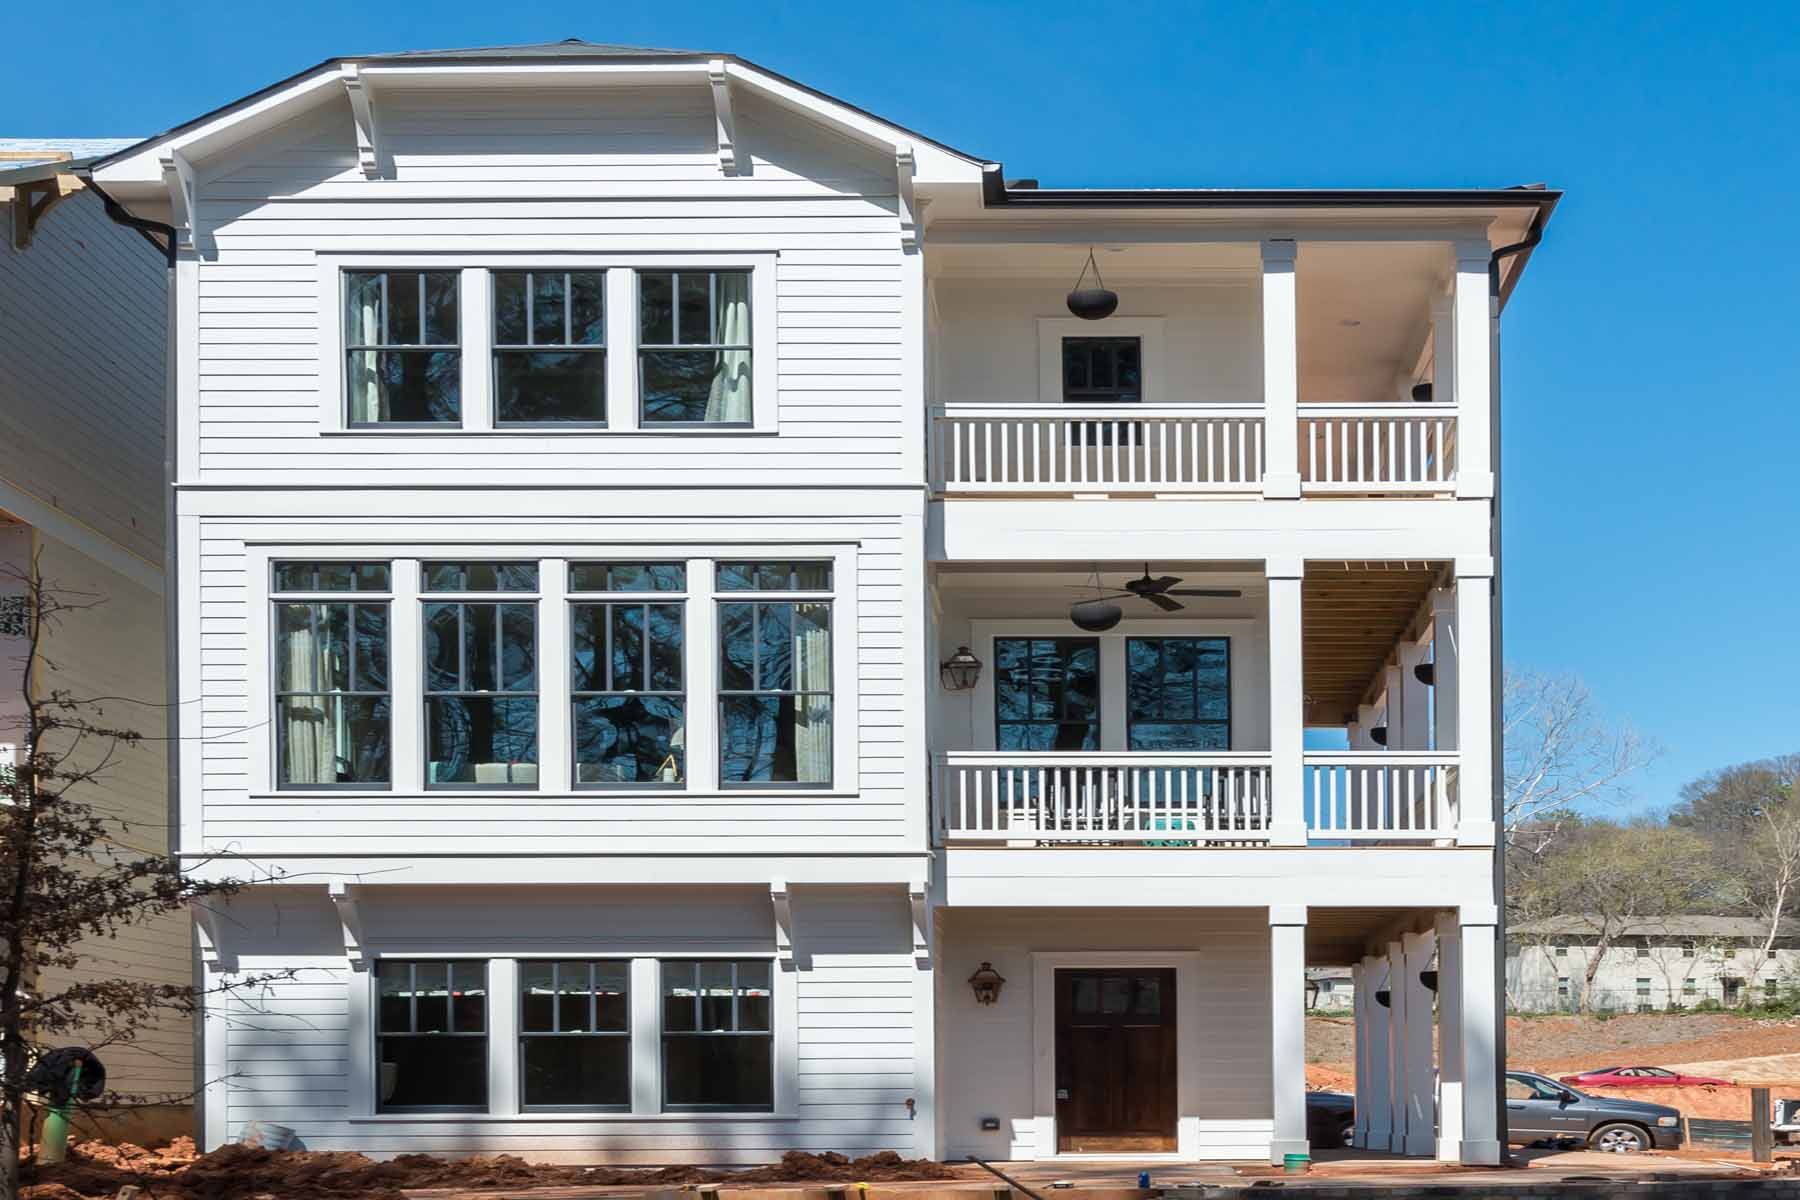 Single Family Home for Sale at Gorgeous Decatur Cottage 2820 Craigie Avenue Lot 6 Decatur, Georgia, 30030 United States